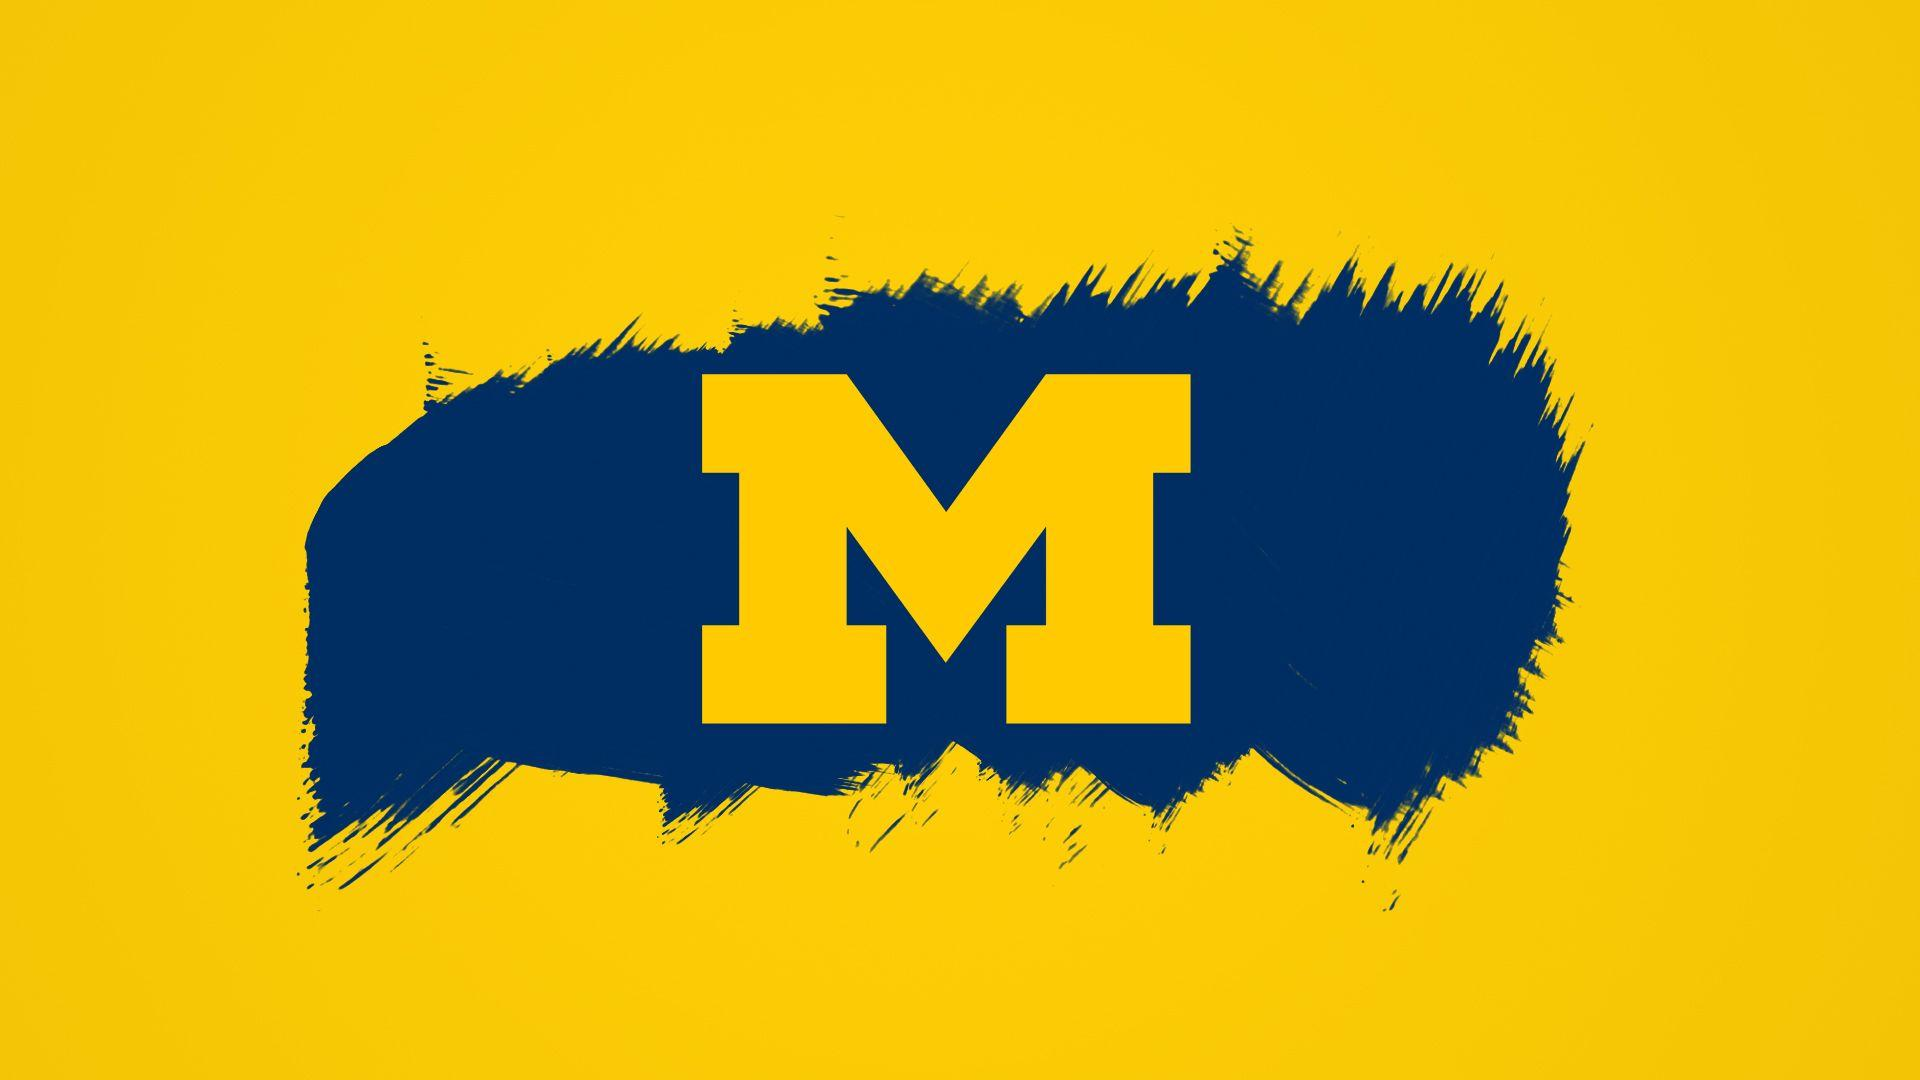 50 University Of Michigan Screensaver Wallpaper On